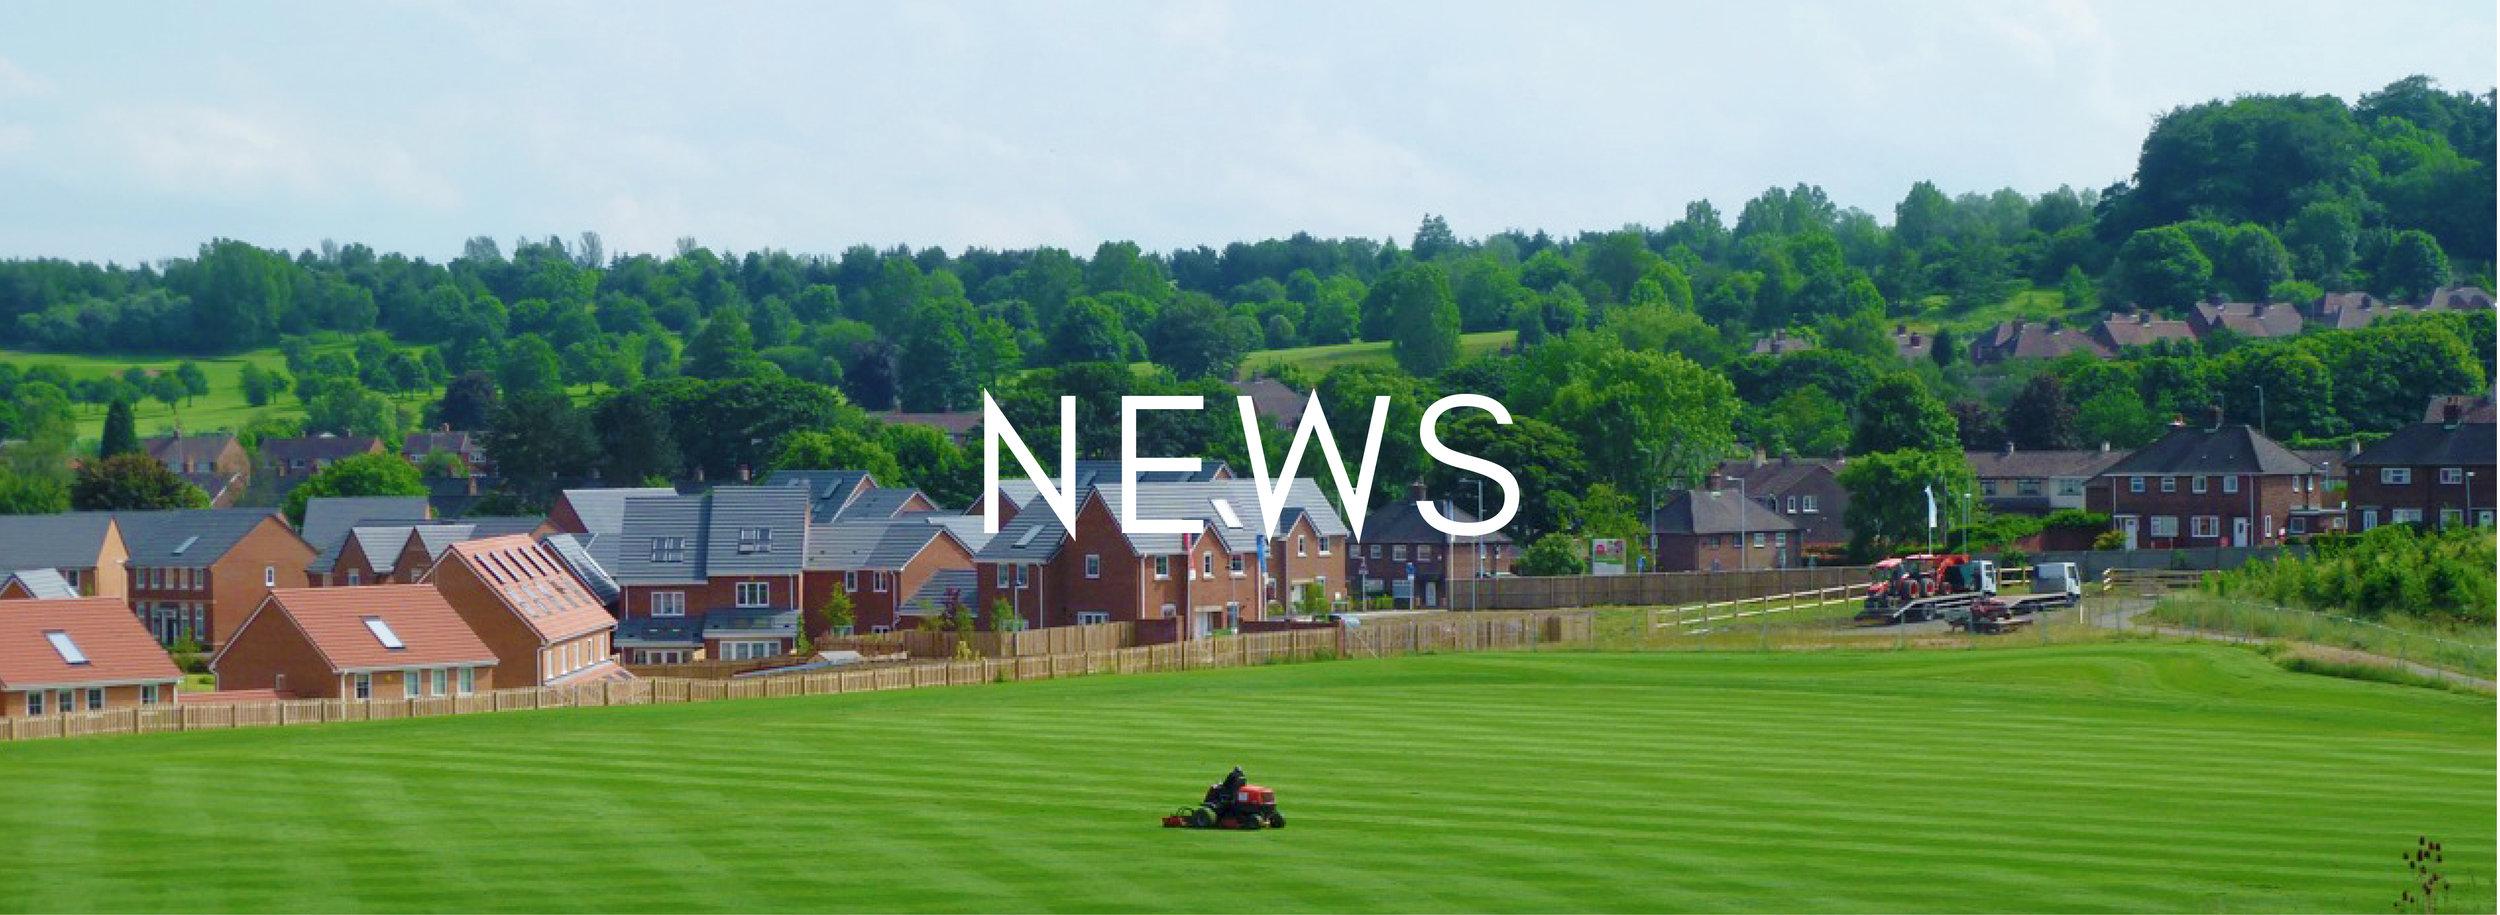 sports-pitch-construction-sports-pitch-drainage-golf-course-construction-golf-course-drainage-news